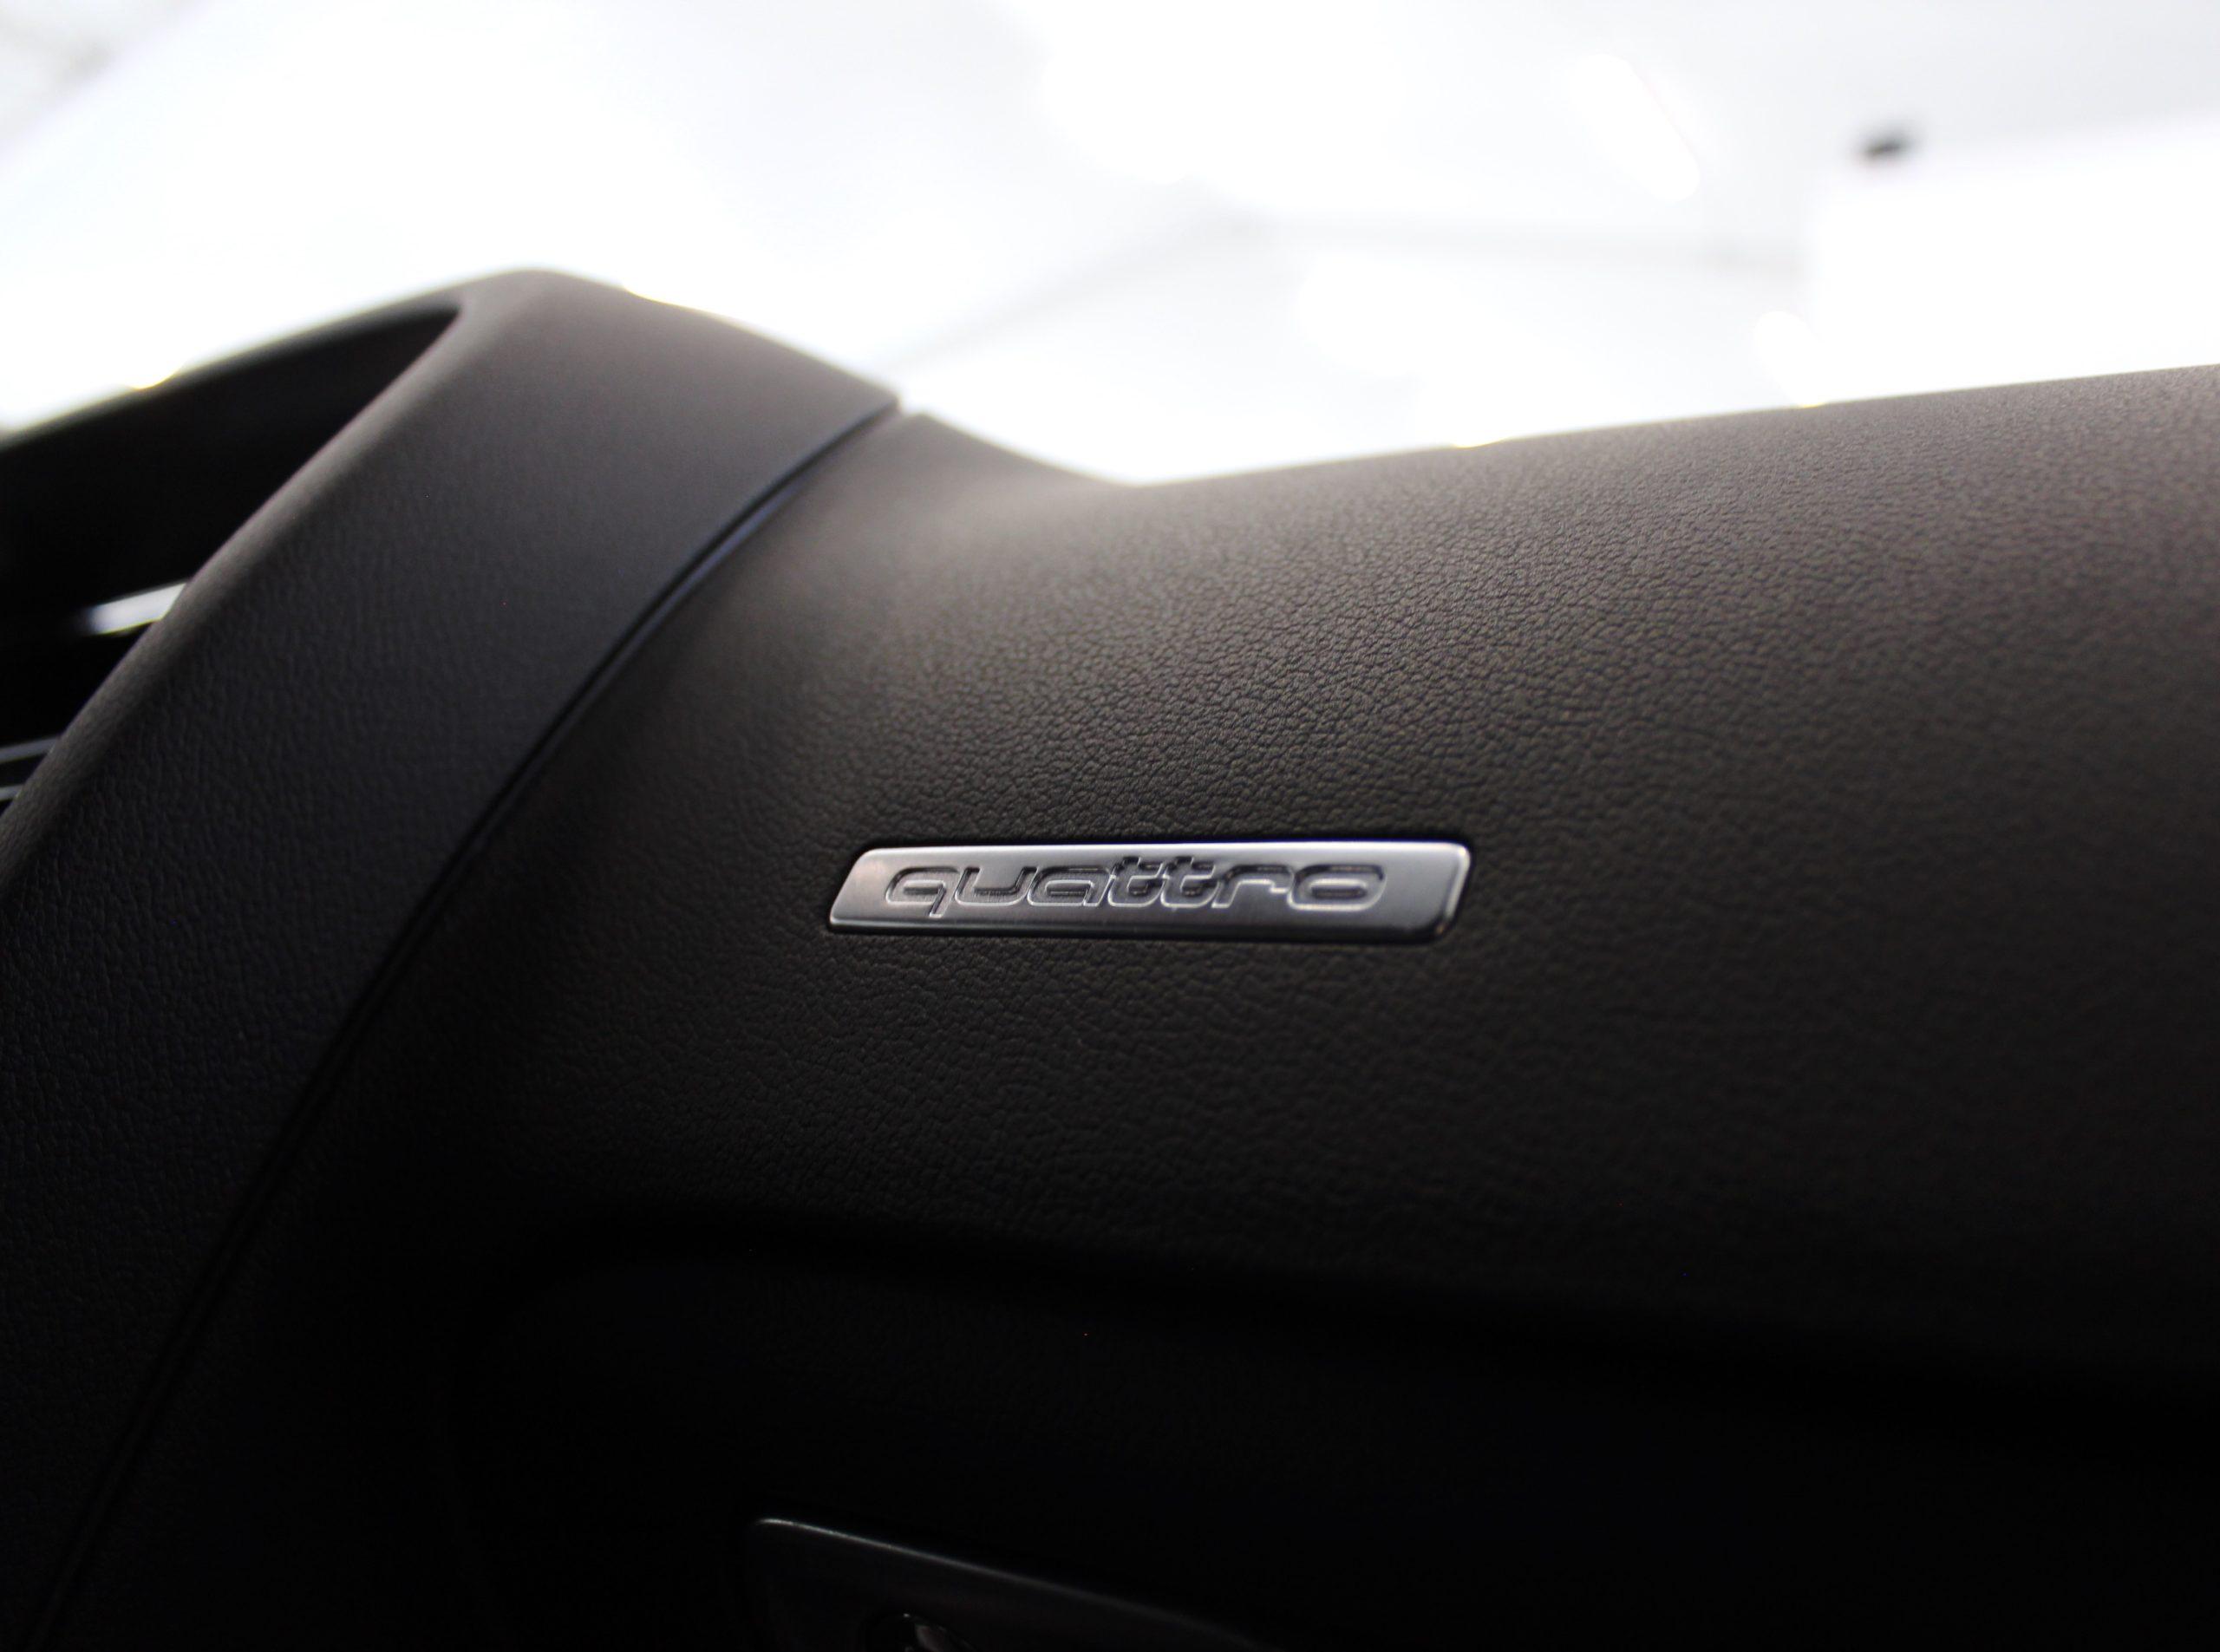 Audi A5 Sb 2.0 TFSI Quattro S Tronic Proline Alpine Euro 6 225hk